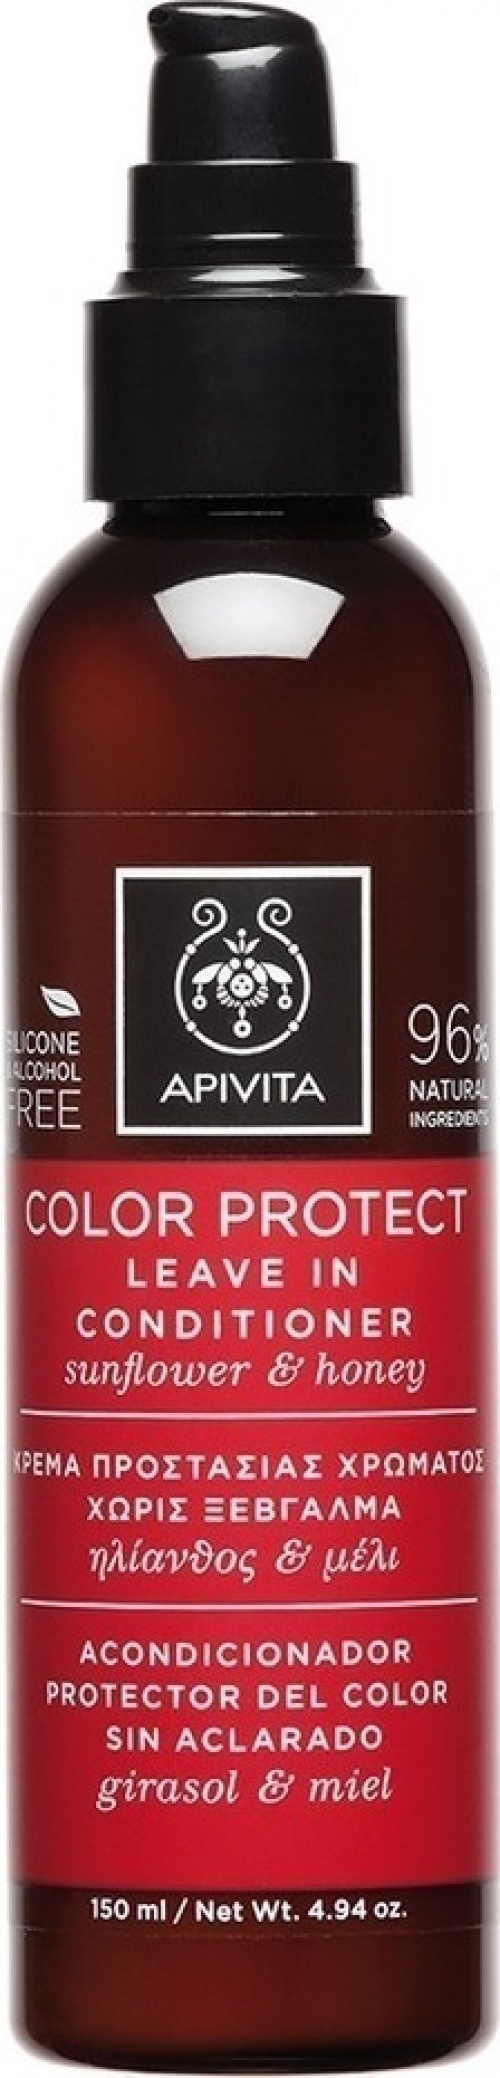 Colour Protect Leave in Conditioner Κρέμα Προστασίας Χρώματος χωρίς Ξέβγαλμα, για Βαμμένα Μαλλιά με Ηλίανθο & Μέλι, 150ml